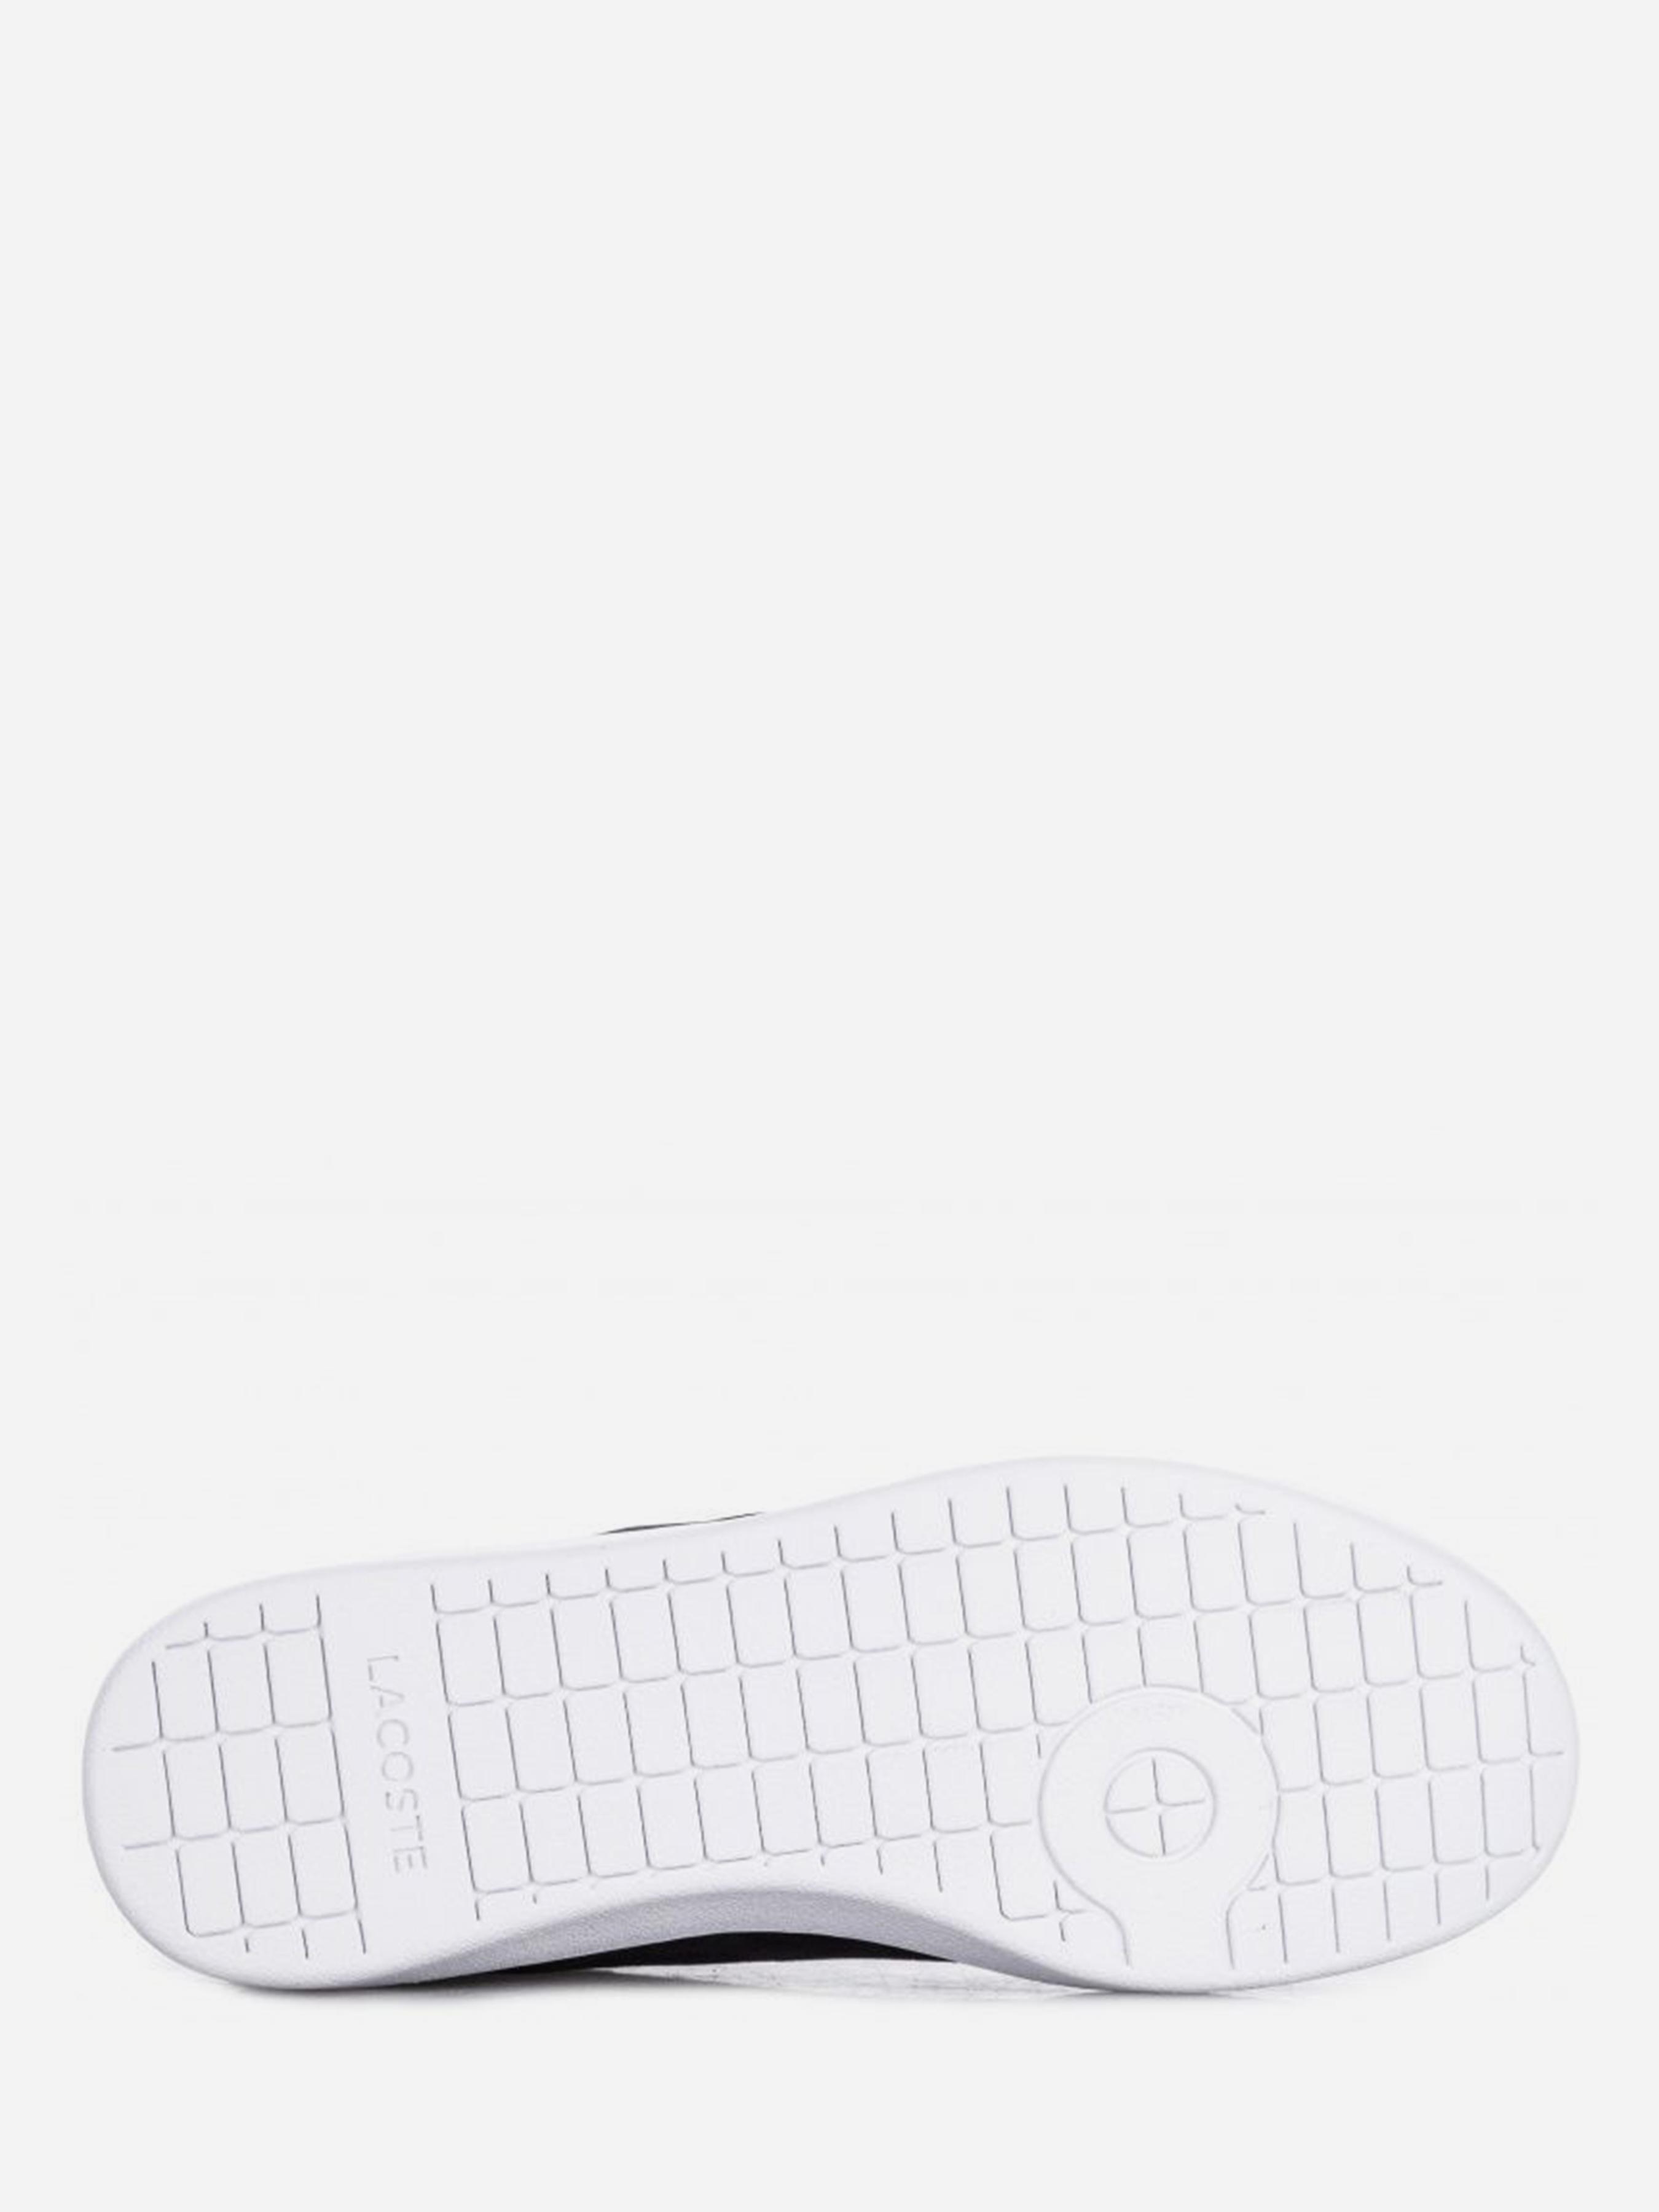 Ботинки для женщин Lacoste CARNABY EVO LL169 смотреть, 2017